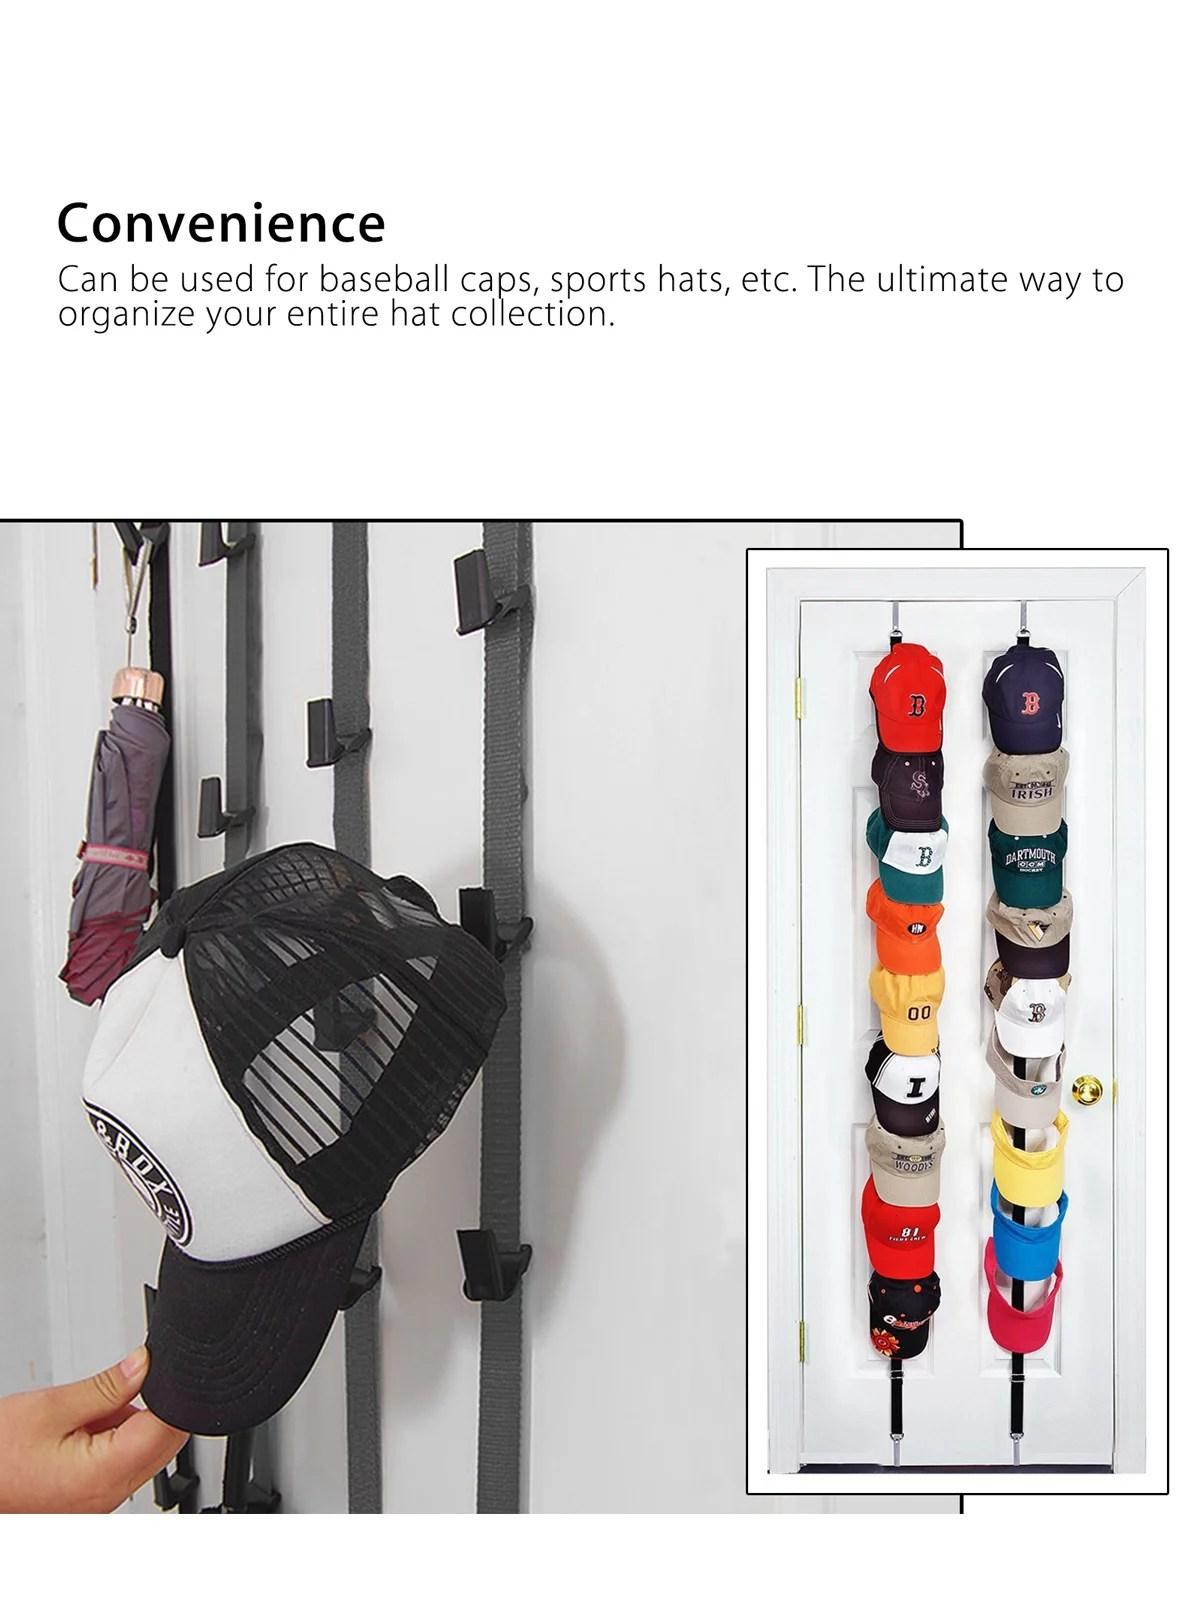 cap rack pro hanging closet hat organizer baseball cap organizer holds 16 caps